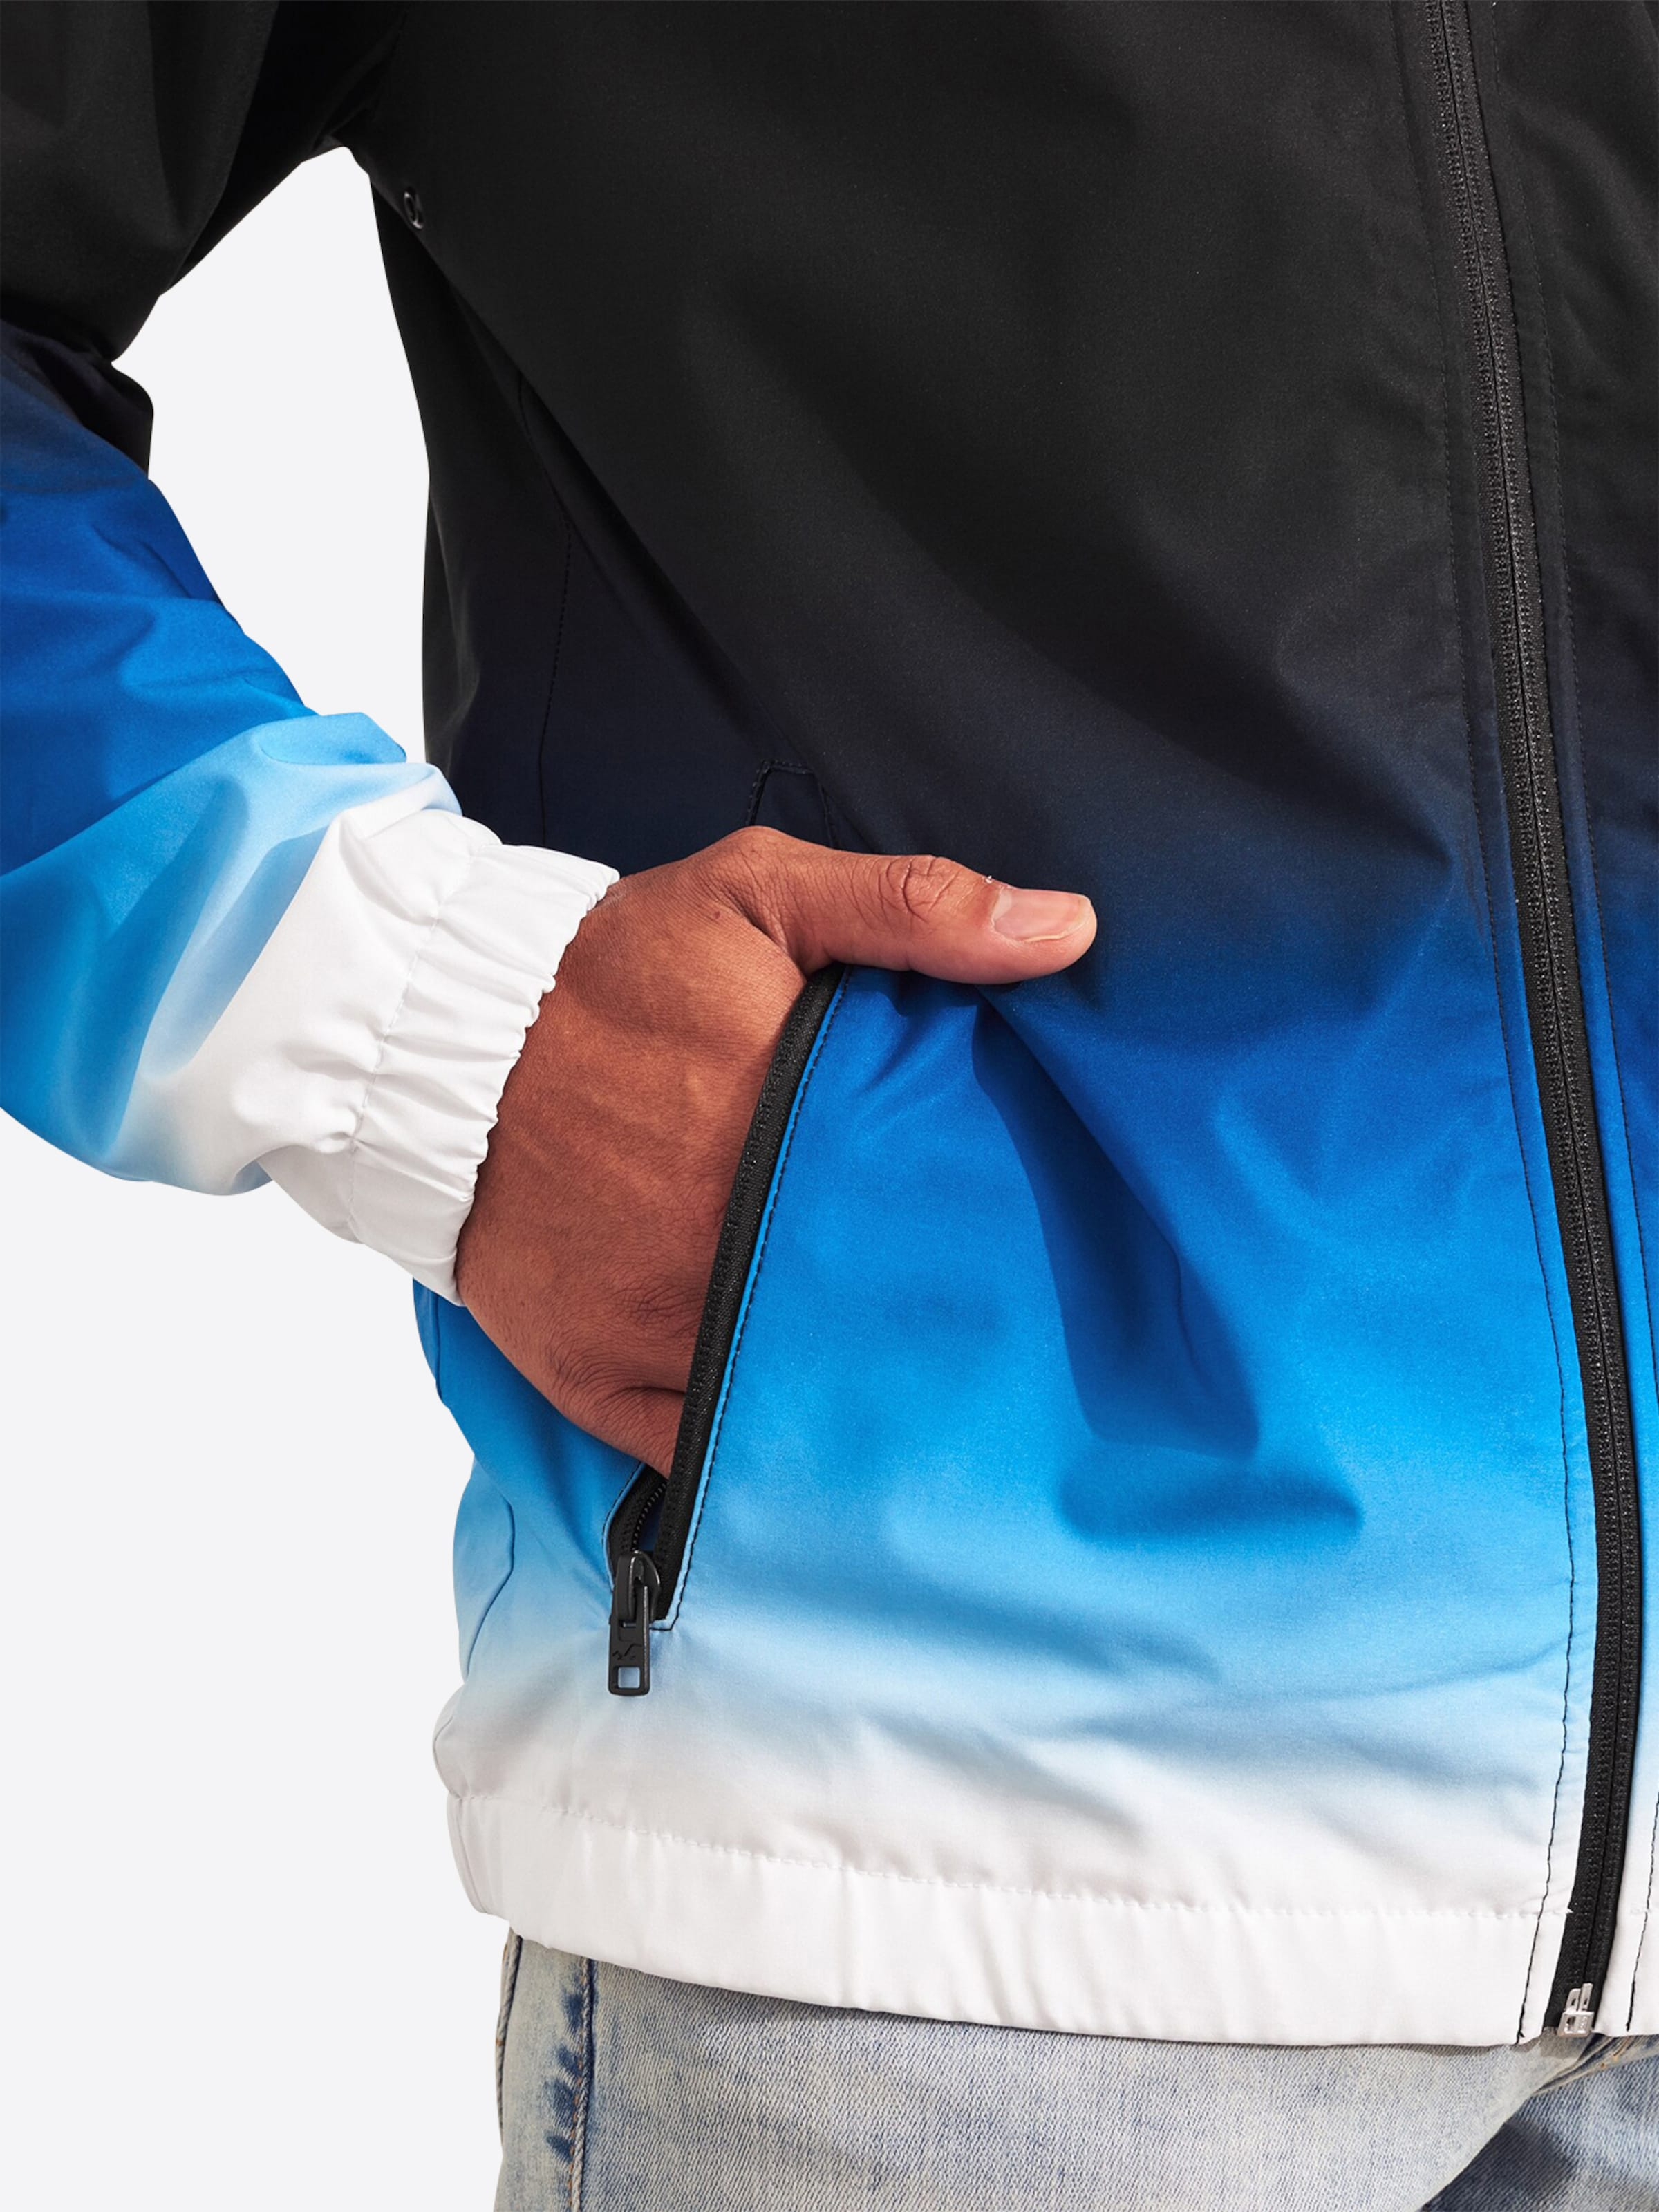 BlauSchwarz Hollister Jacke 'bts19 ombre' Weiß In E2WIHY9D